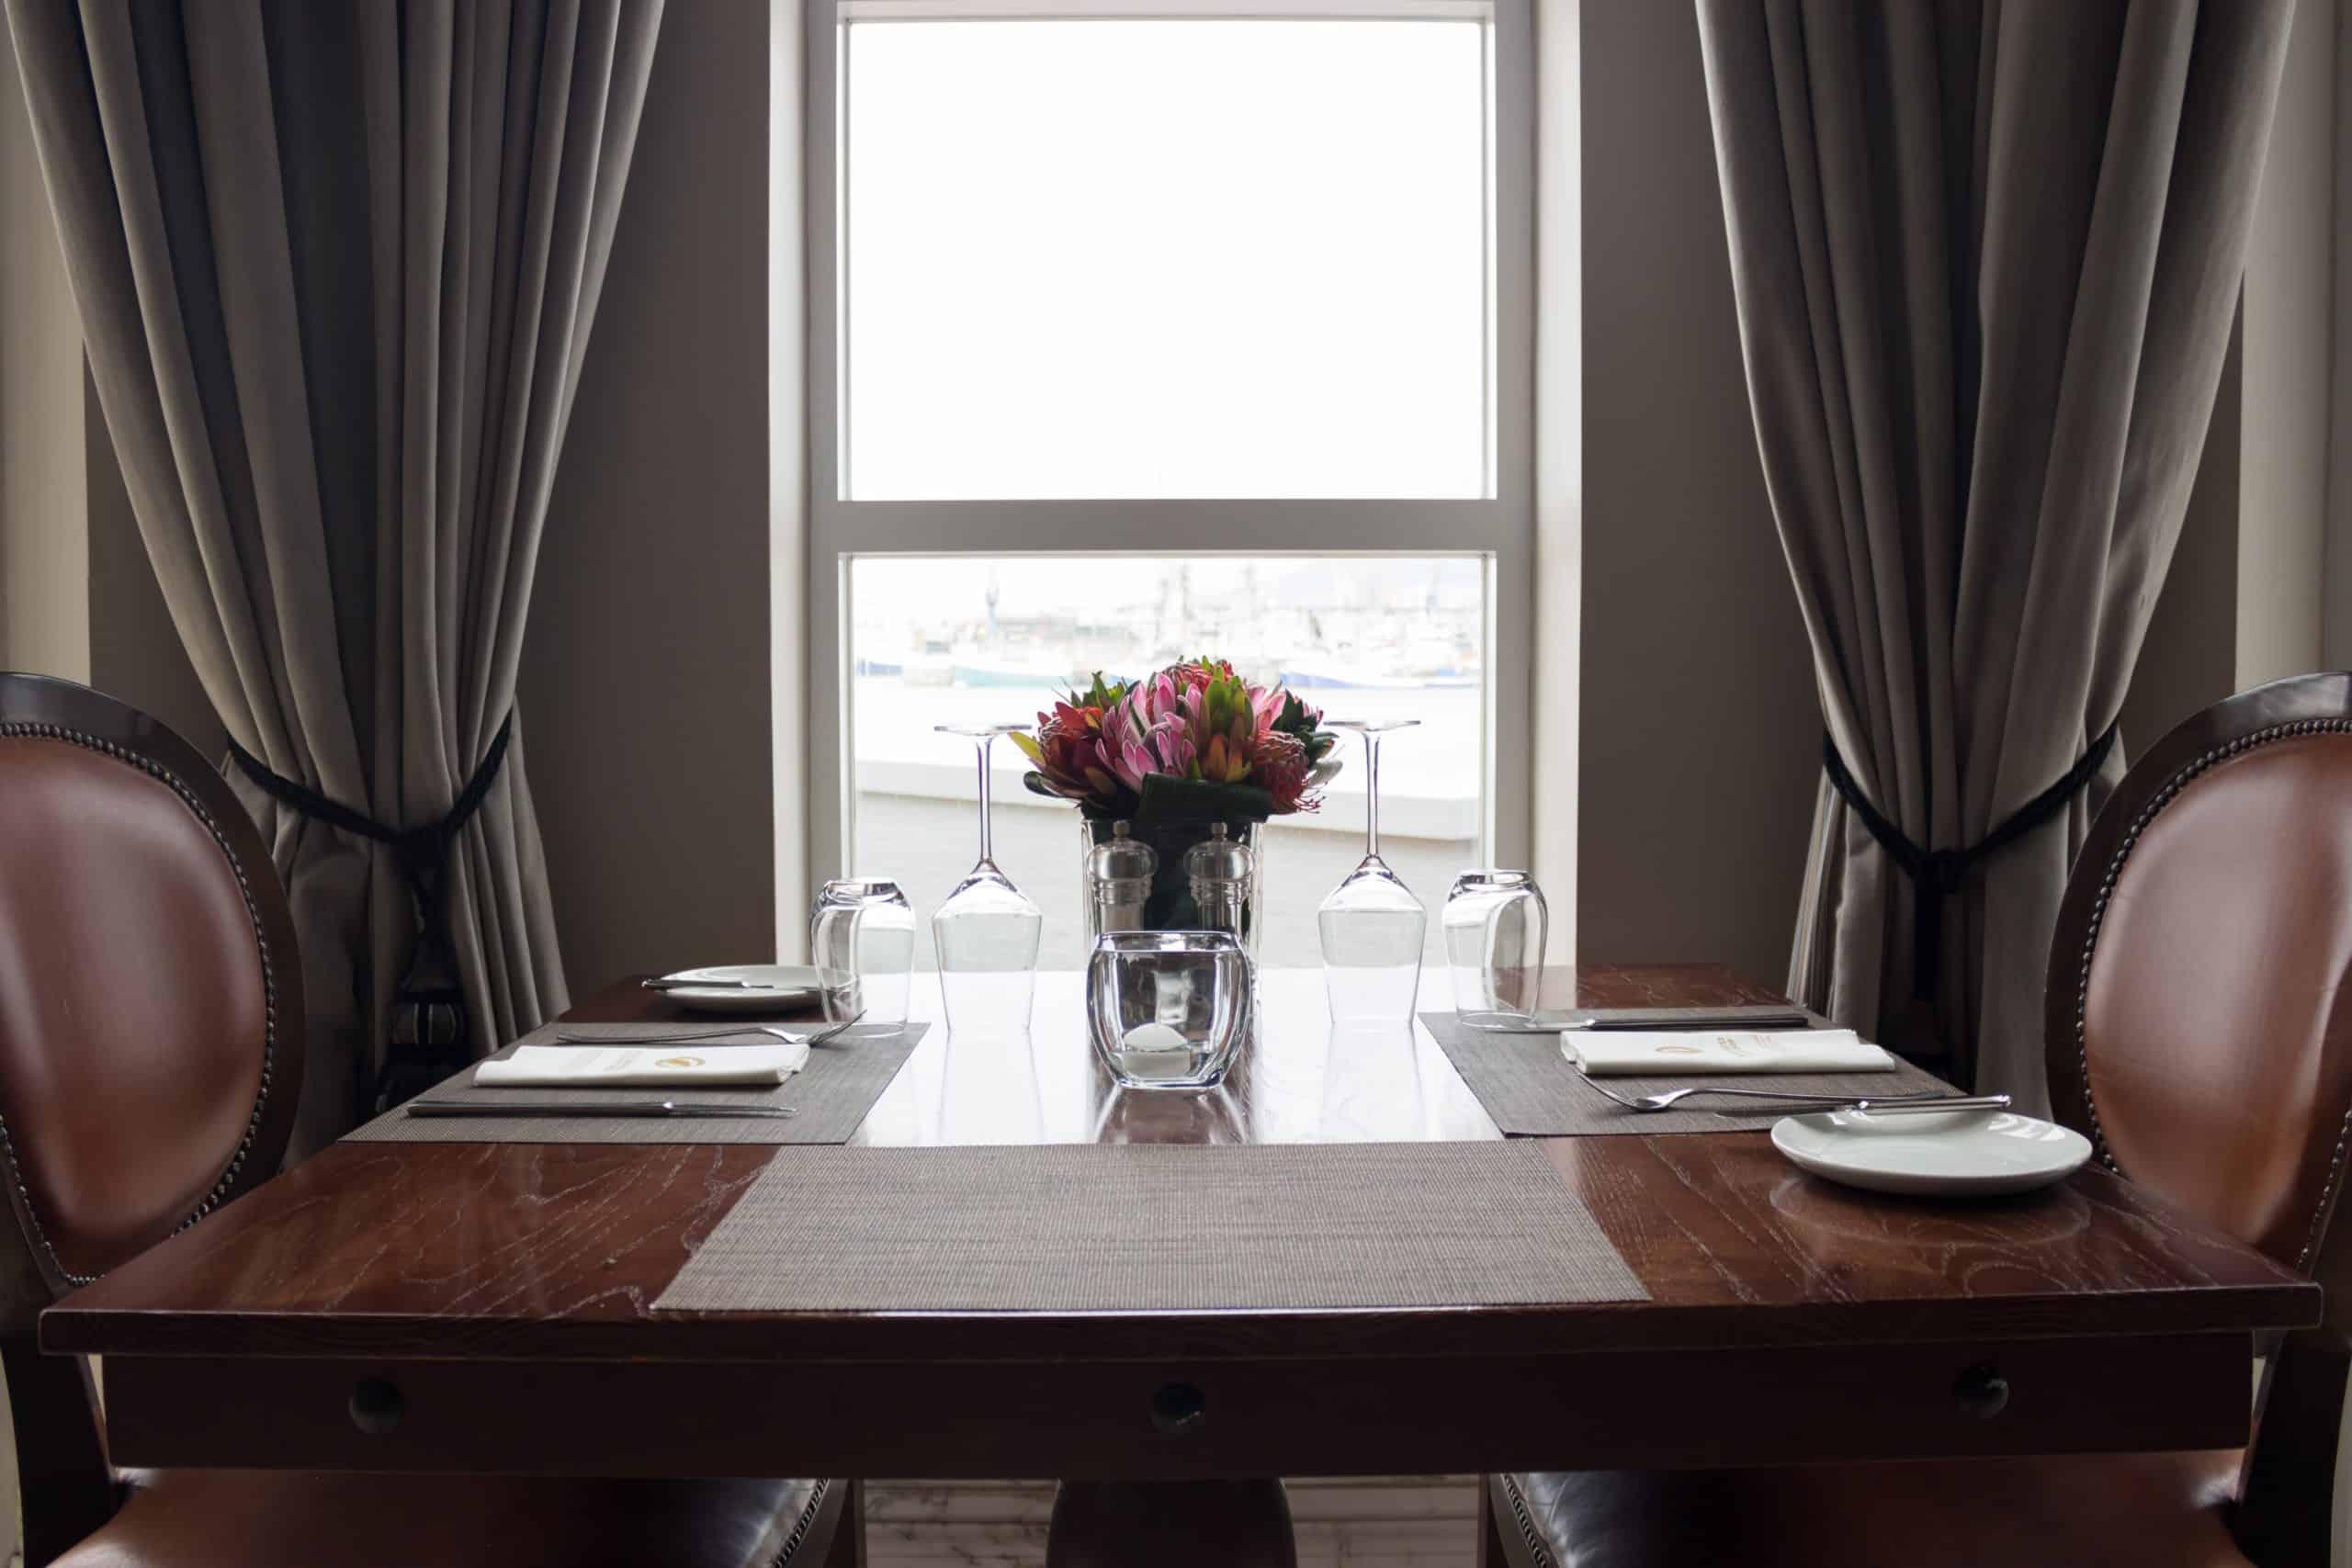 Living Room Lights: Properly Light a Living Room, Let's See In Details